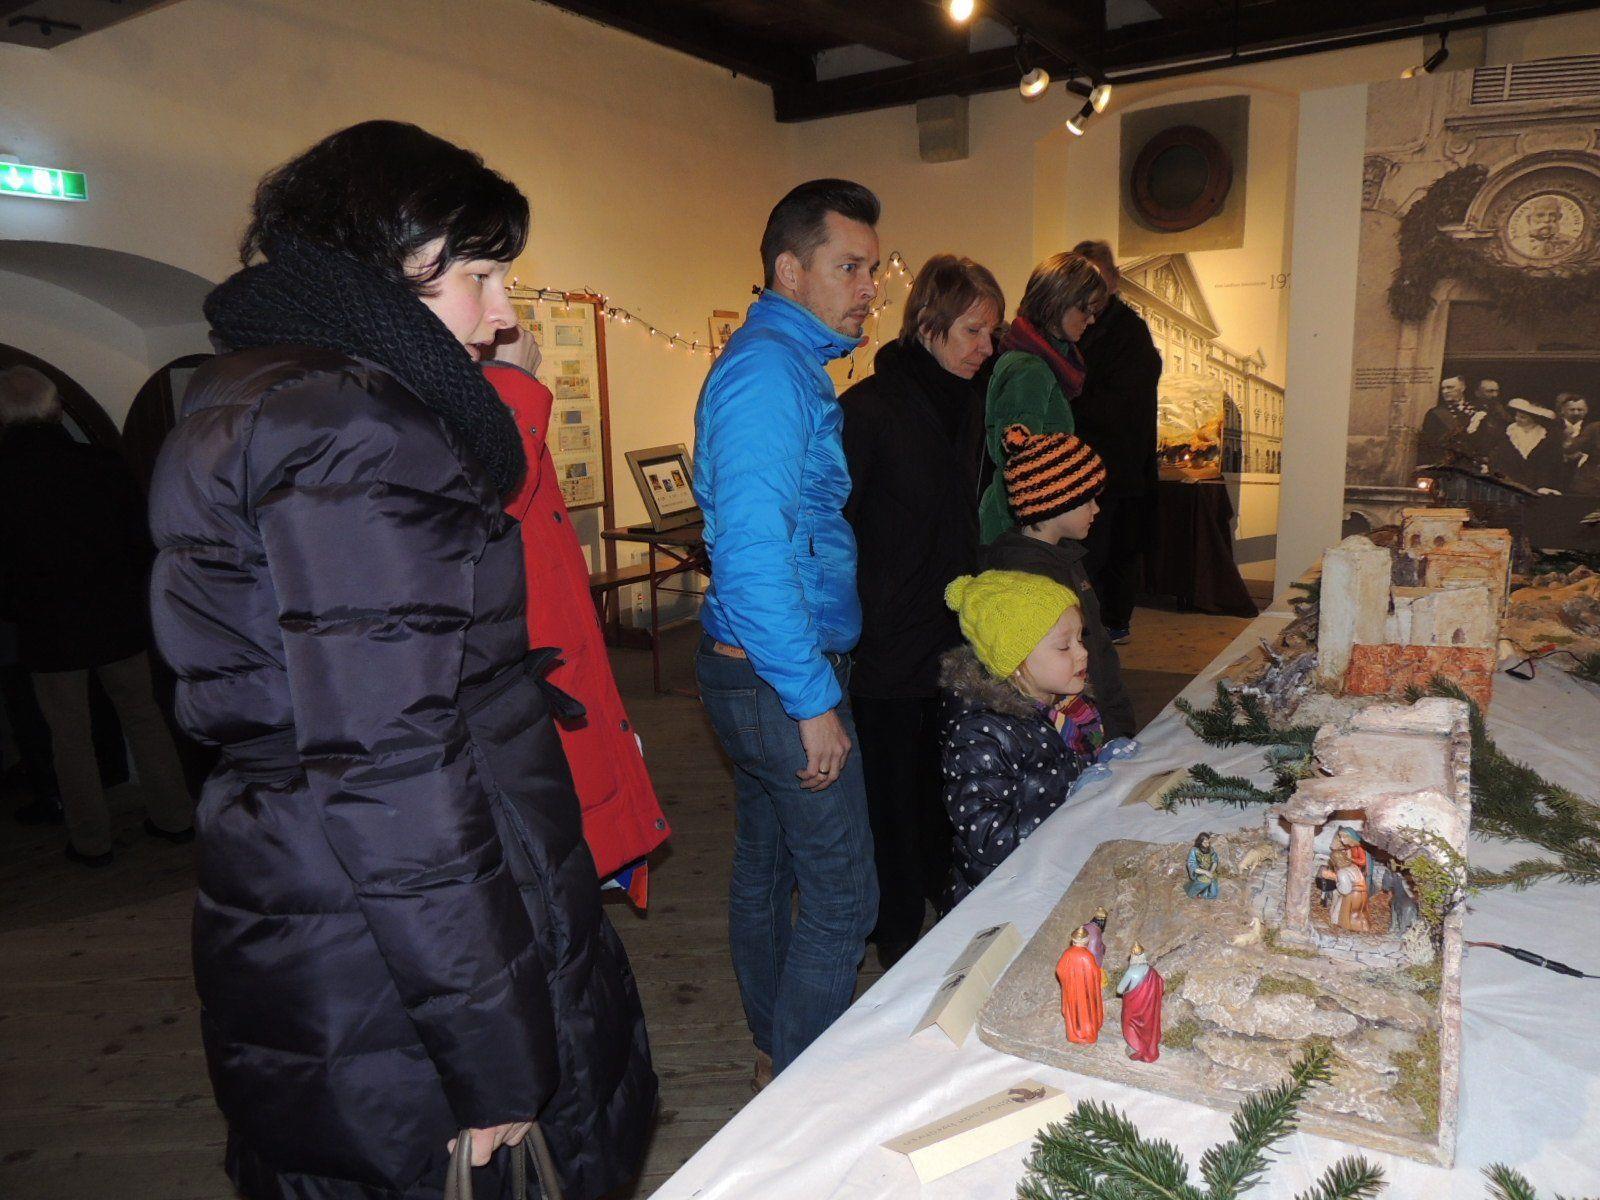 Großes Besucherinteresse an der Krippenausstellung